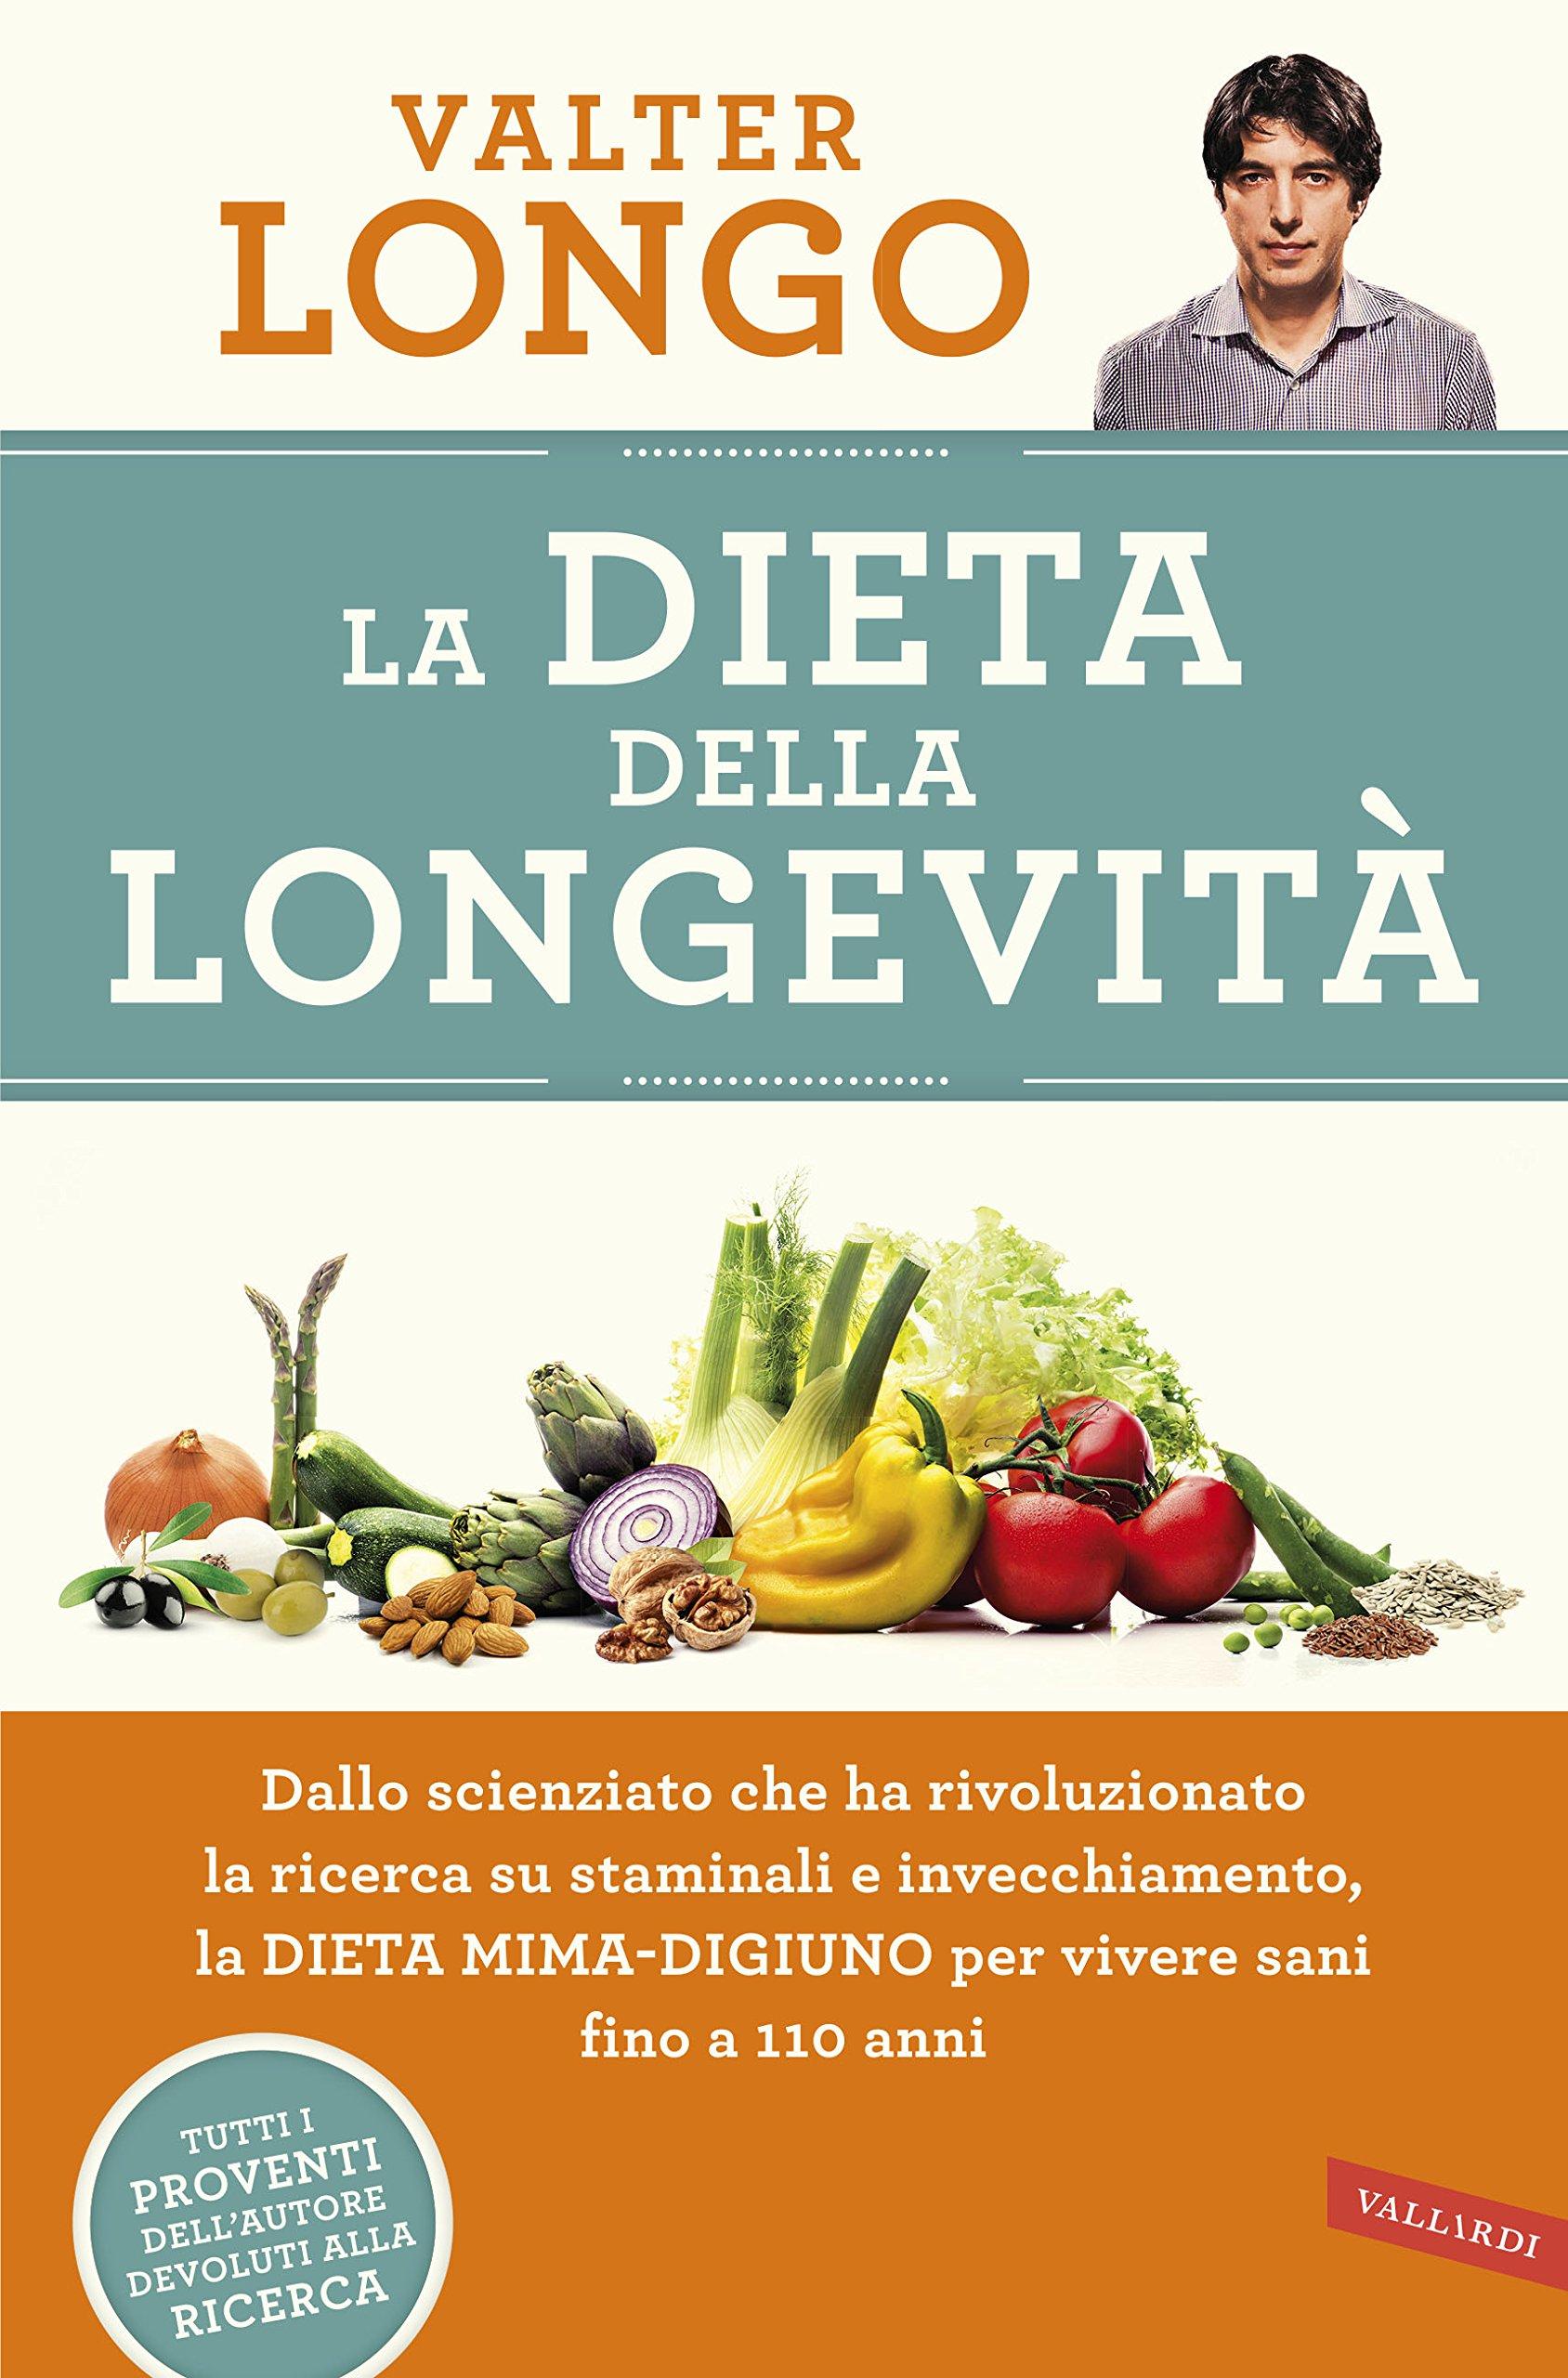 dieta gratuita per livelli flessibili in pdf